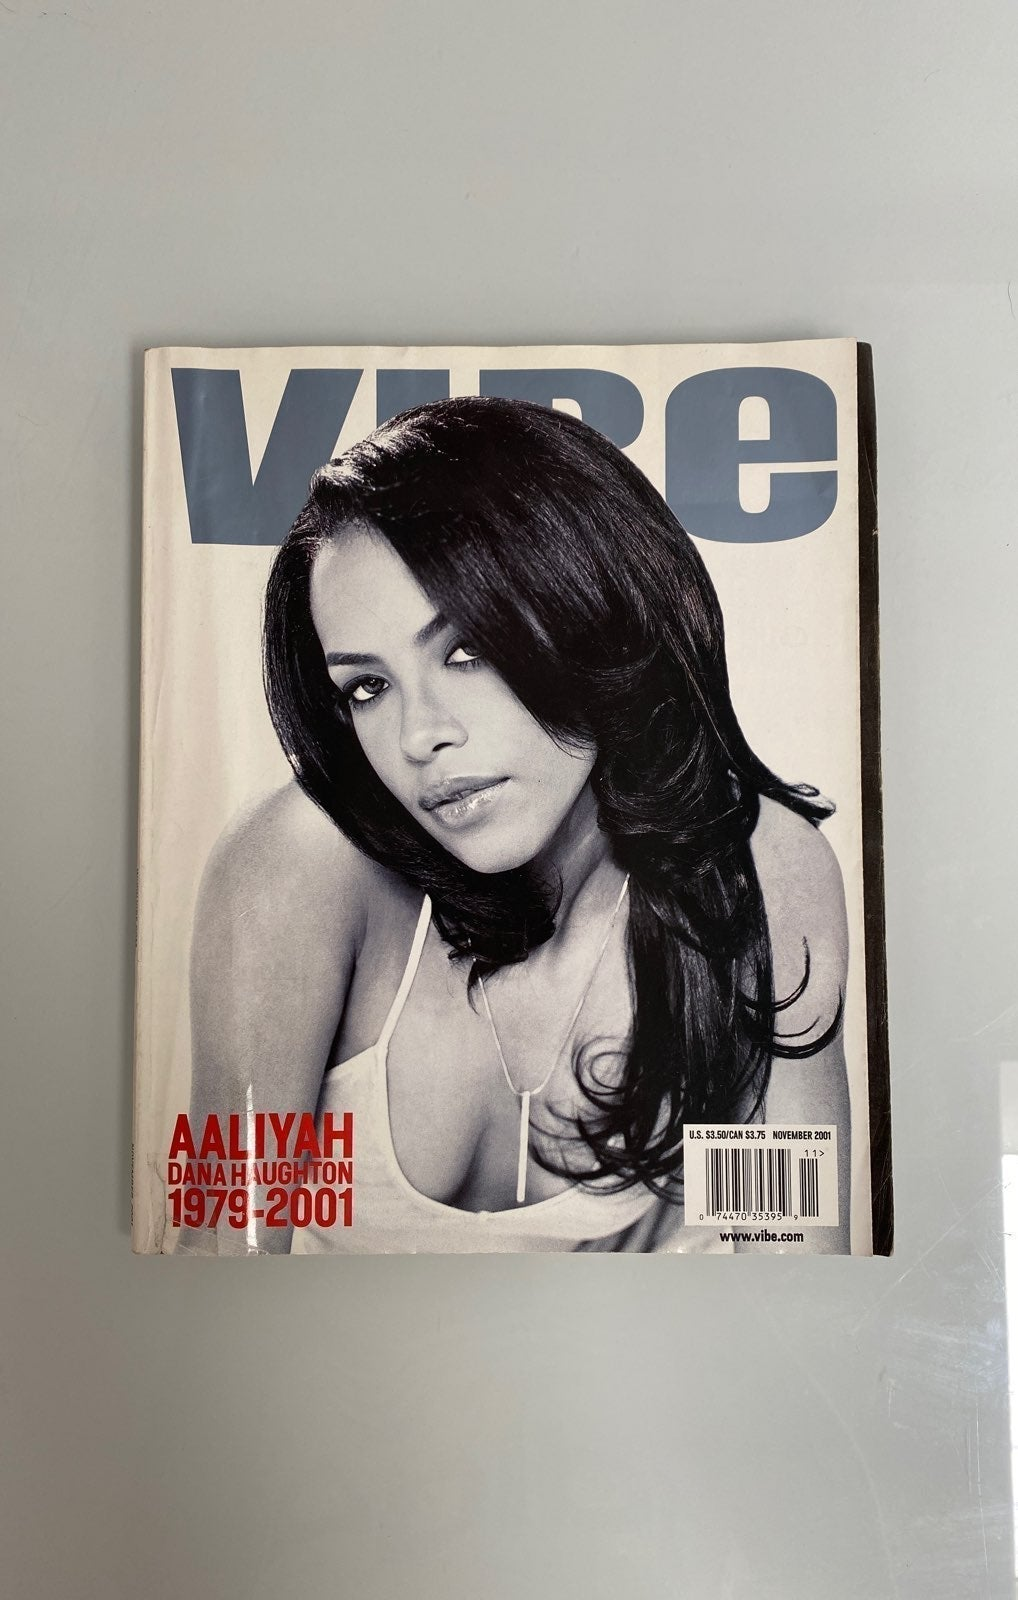 Aaliyah Vibe Magazine November 2001